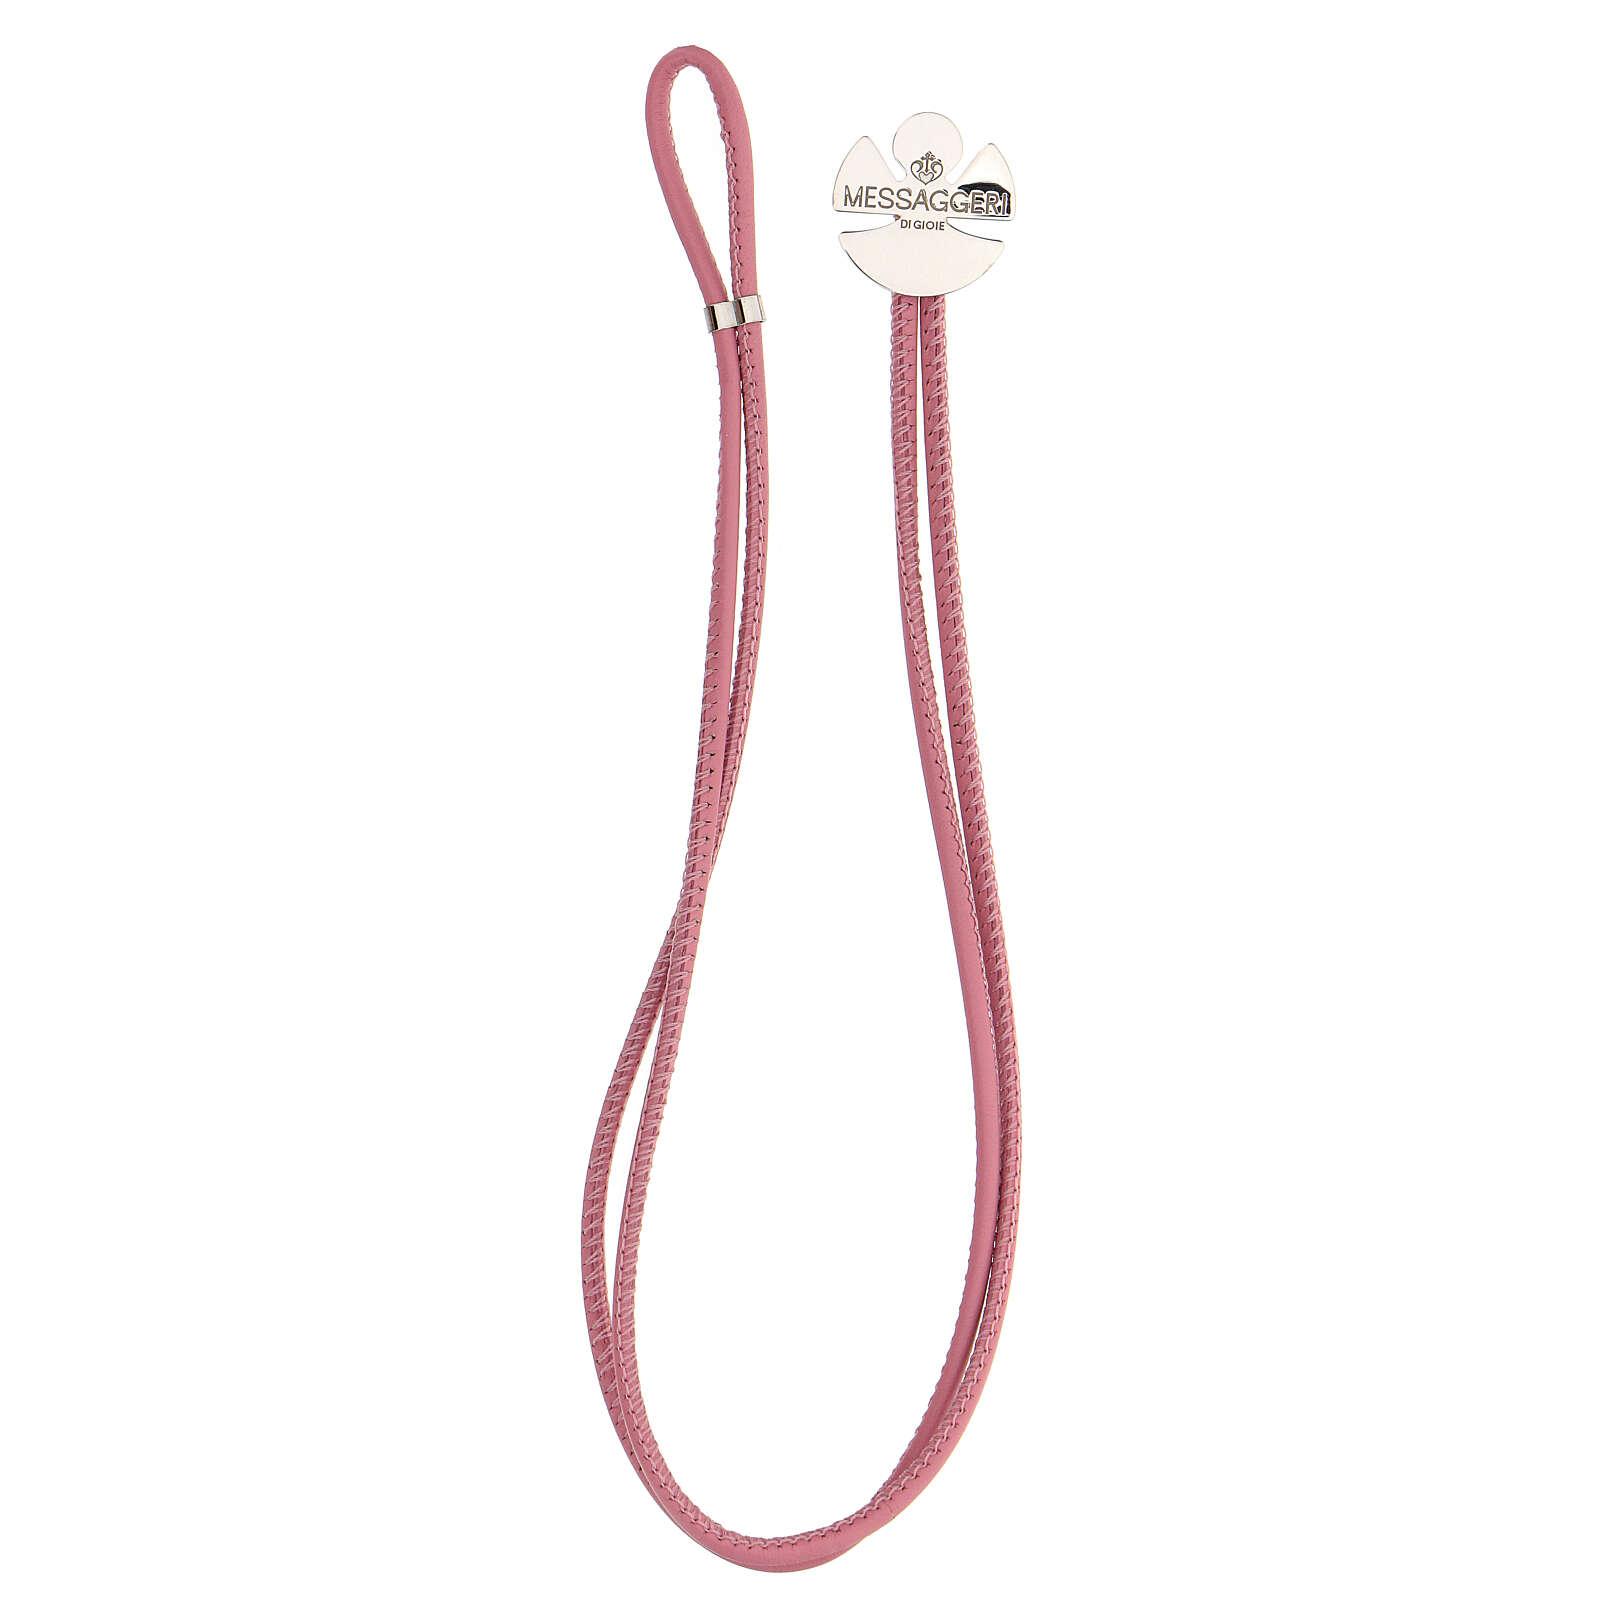 Bracelet ange argent 925 Messaggeri di Gioie rose 4